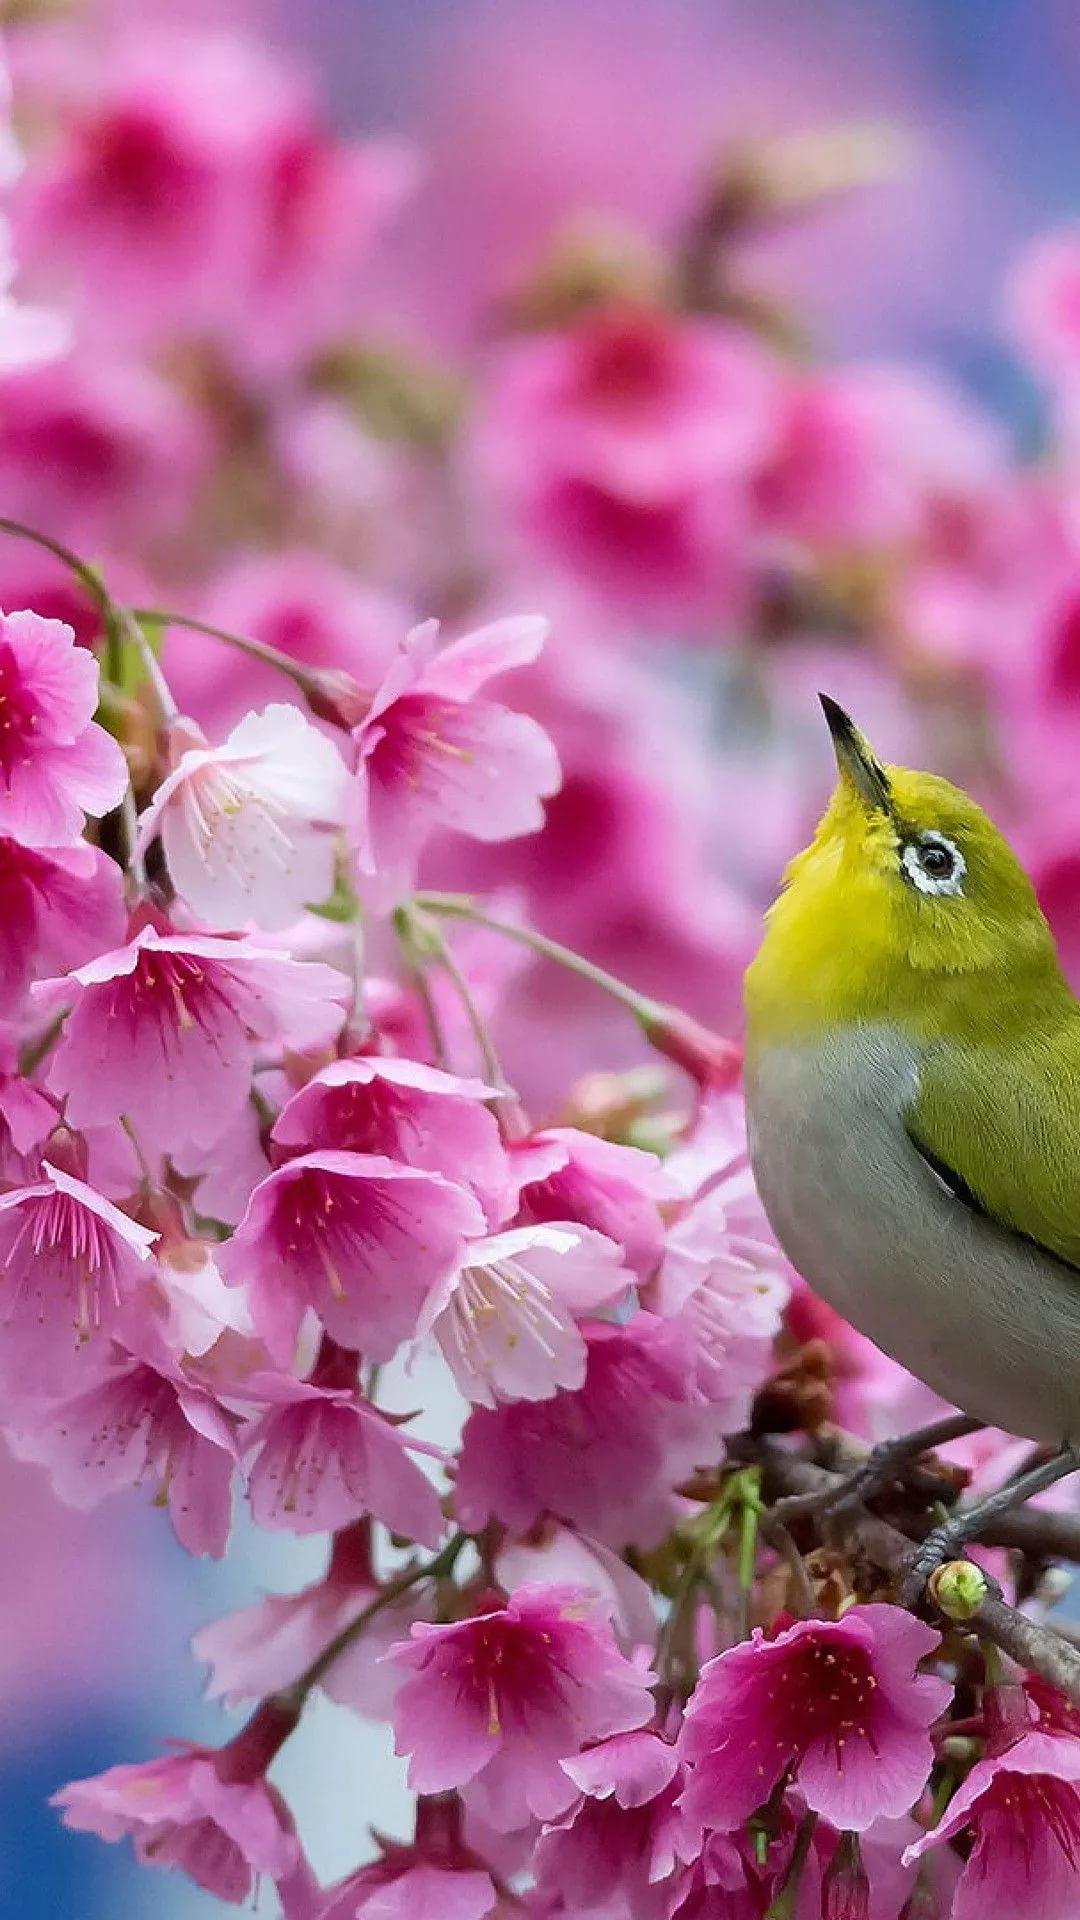 Красивые hd обои весна на телефон 4